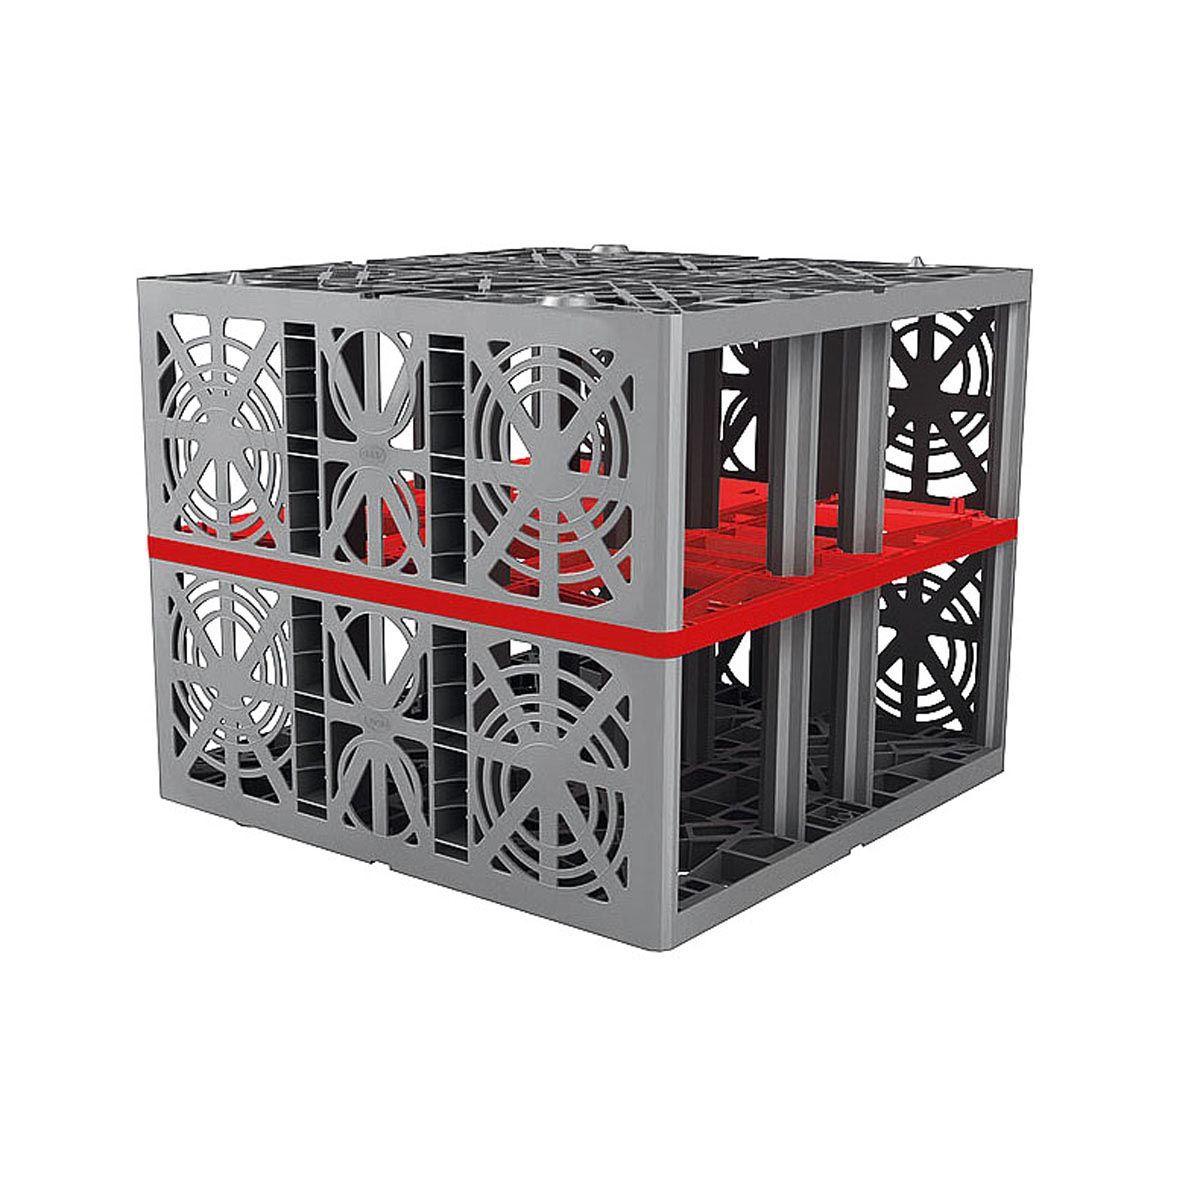 Rigolenmodul, EcoBloc Inspect 420, 800 x 800 x 660 mm